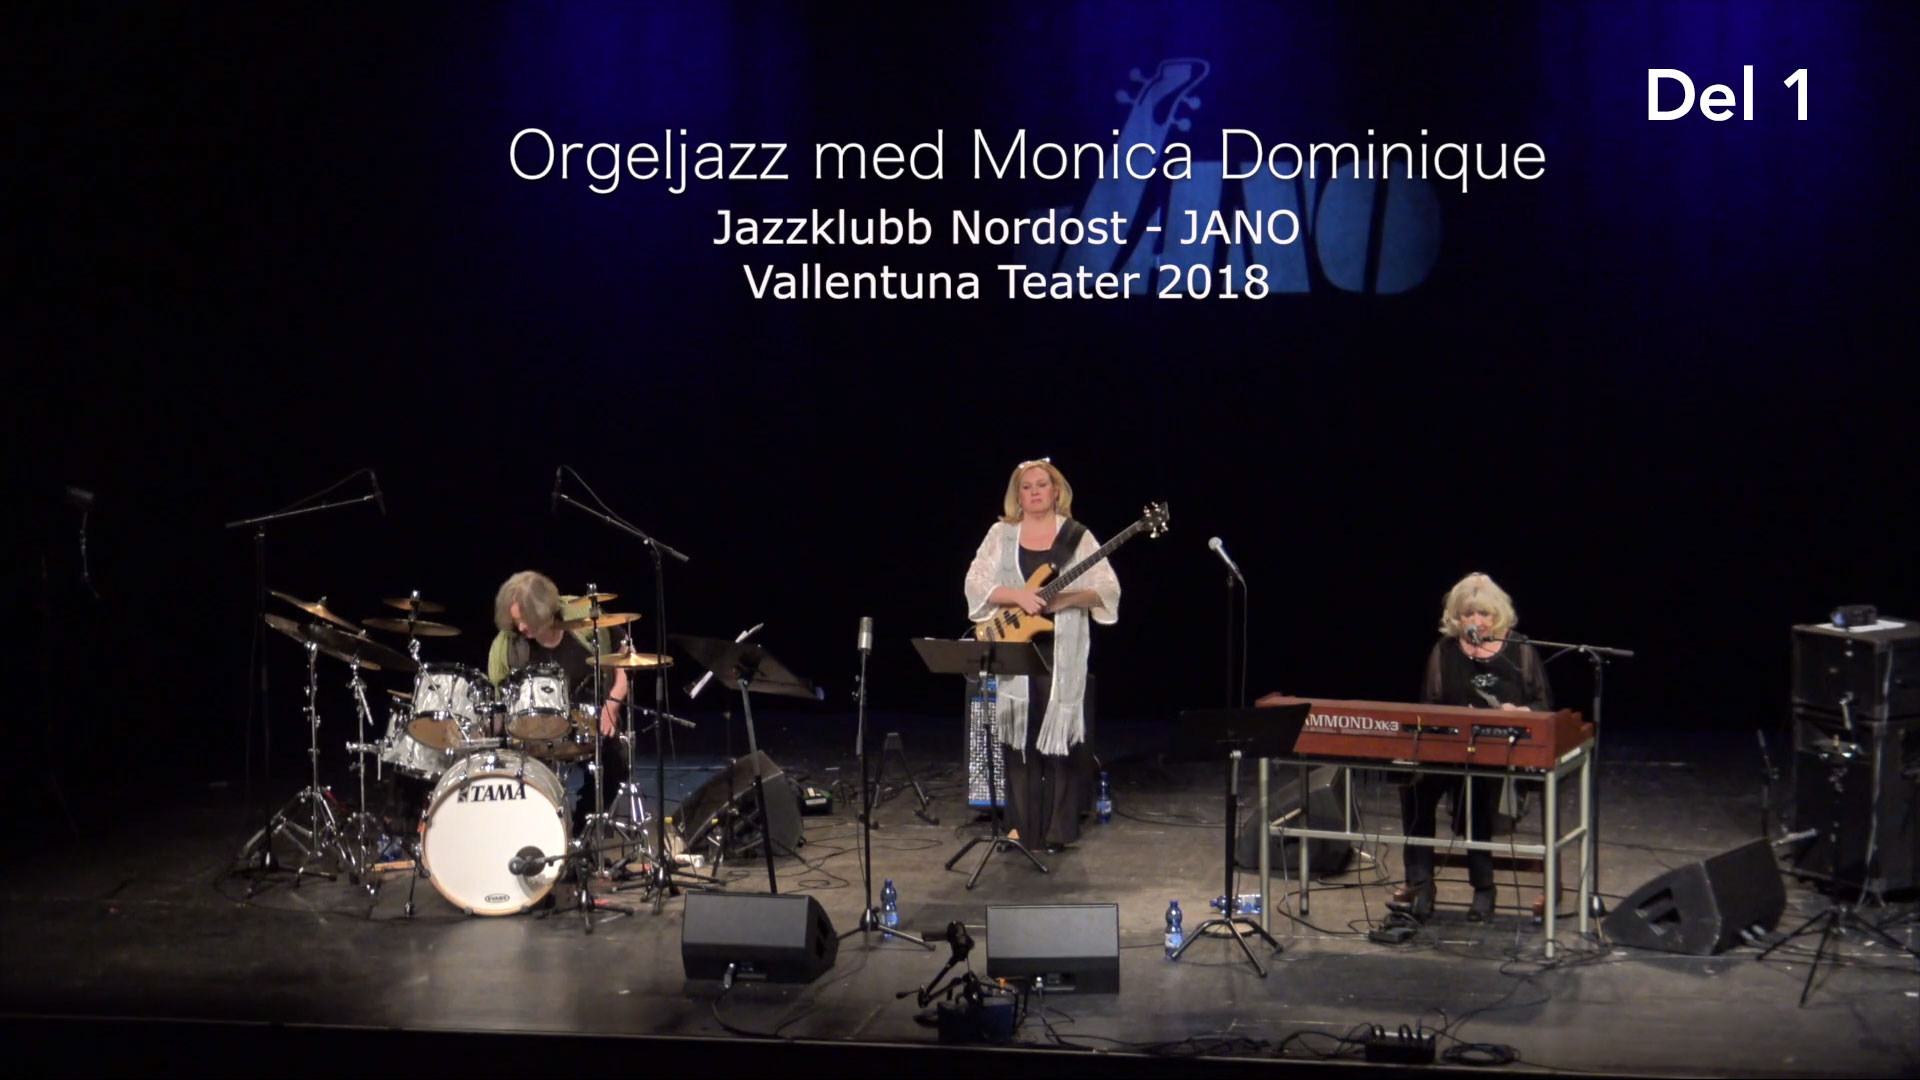 Orgeljazz med Monica Dominique, Amanda Sedgwick & Hayati Kafe